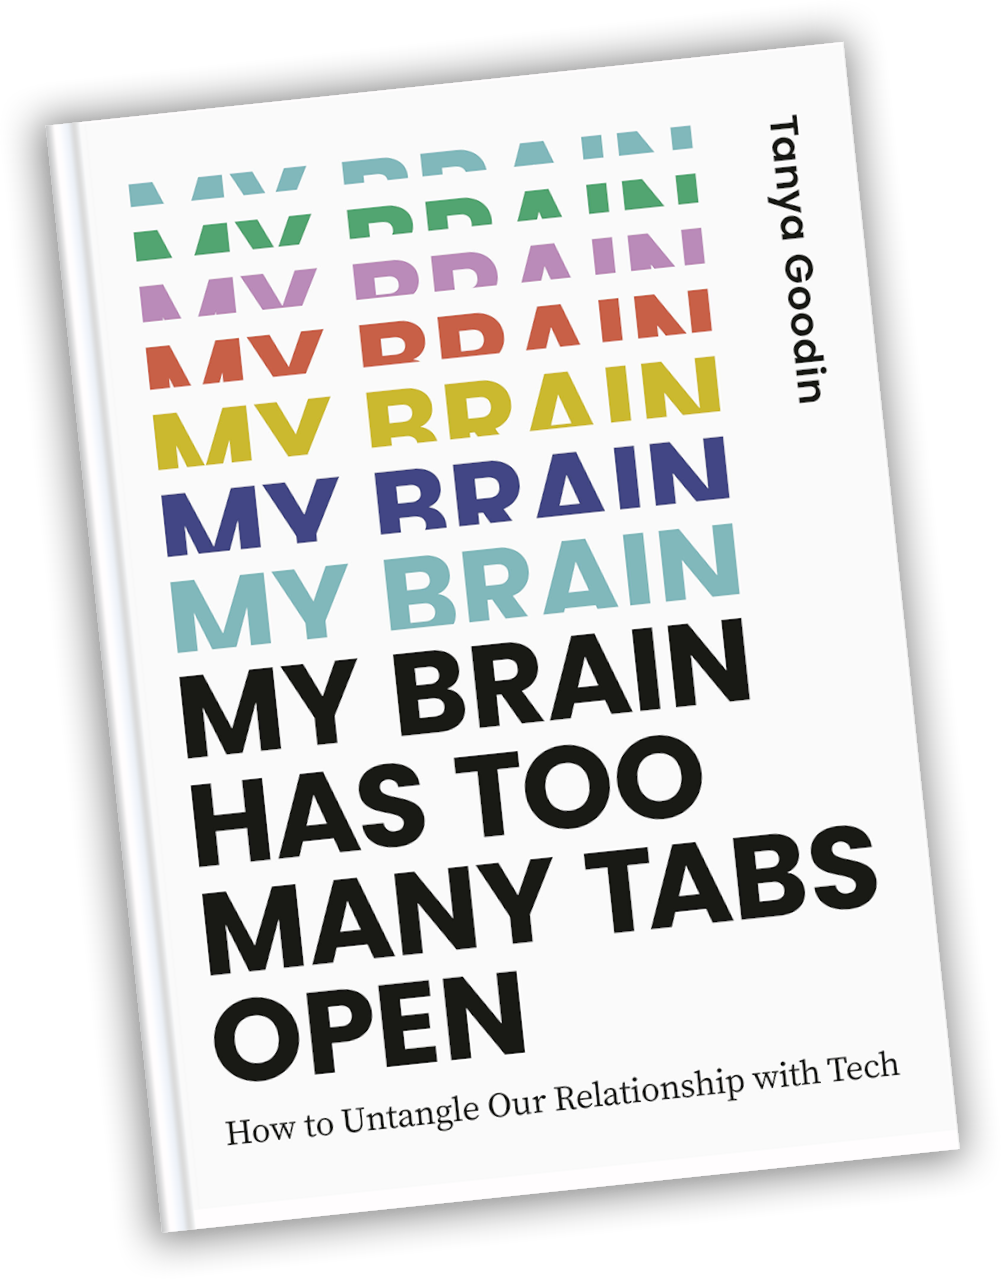 My Brain Has Too Many Tabs Open by Tanya Goodin